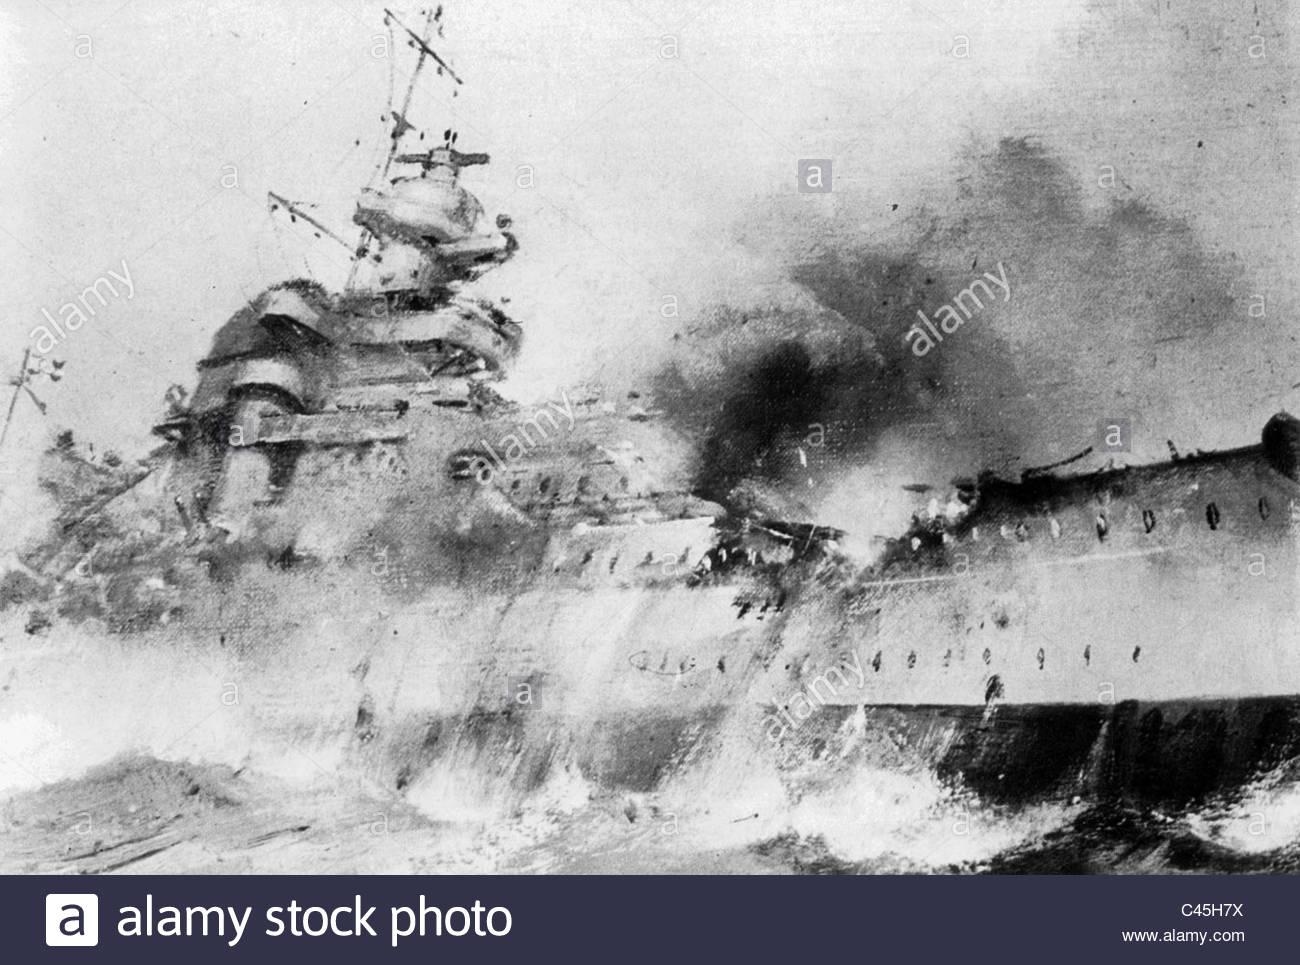 1300x965 Drawing Of The Sinking Battleship